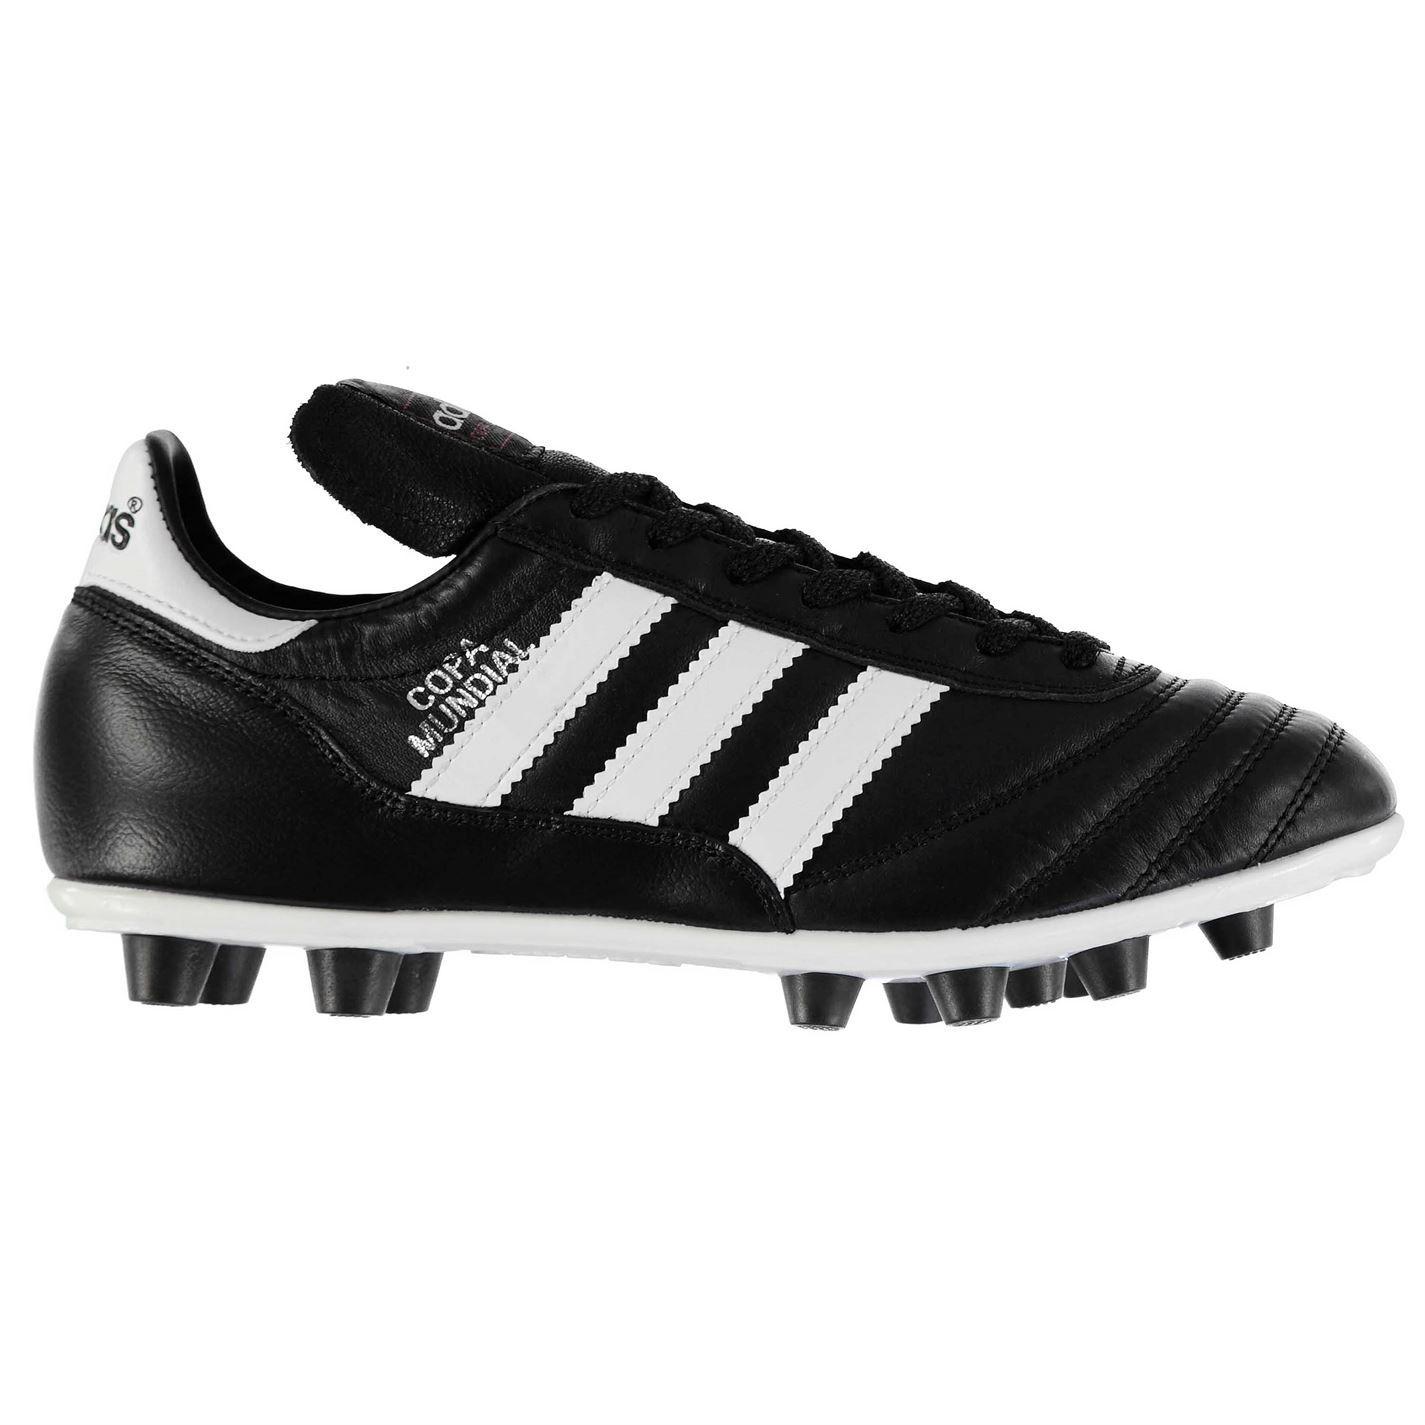 adidas nere da calcio